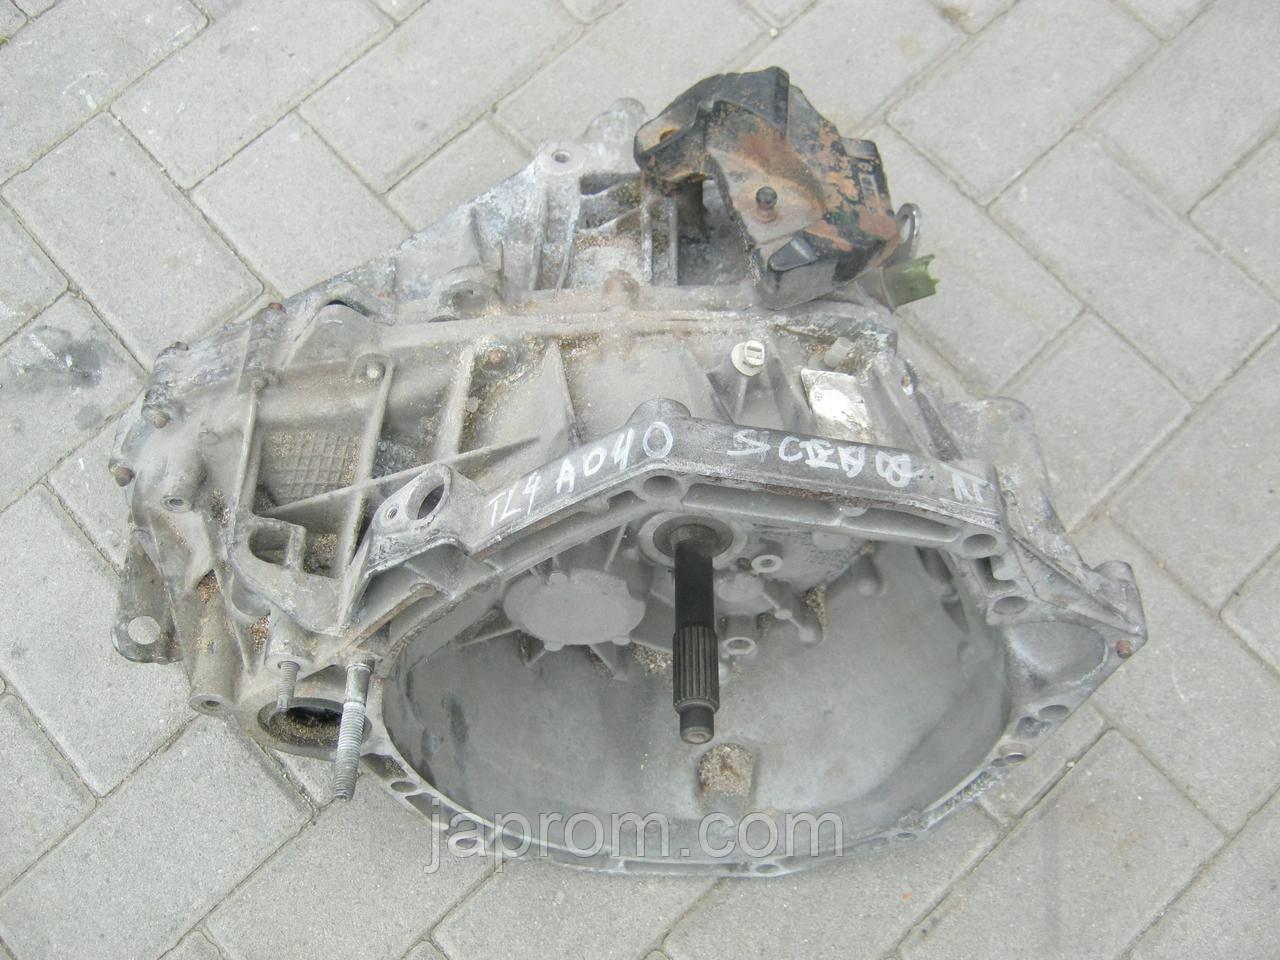 МКПП механічна коробка передач Renault Megane Scenic III 1.5 DCI TL4 A040